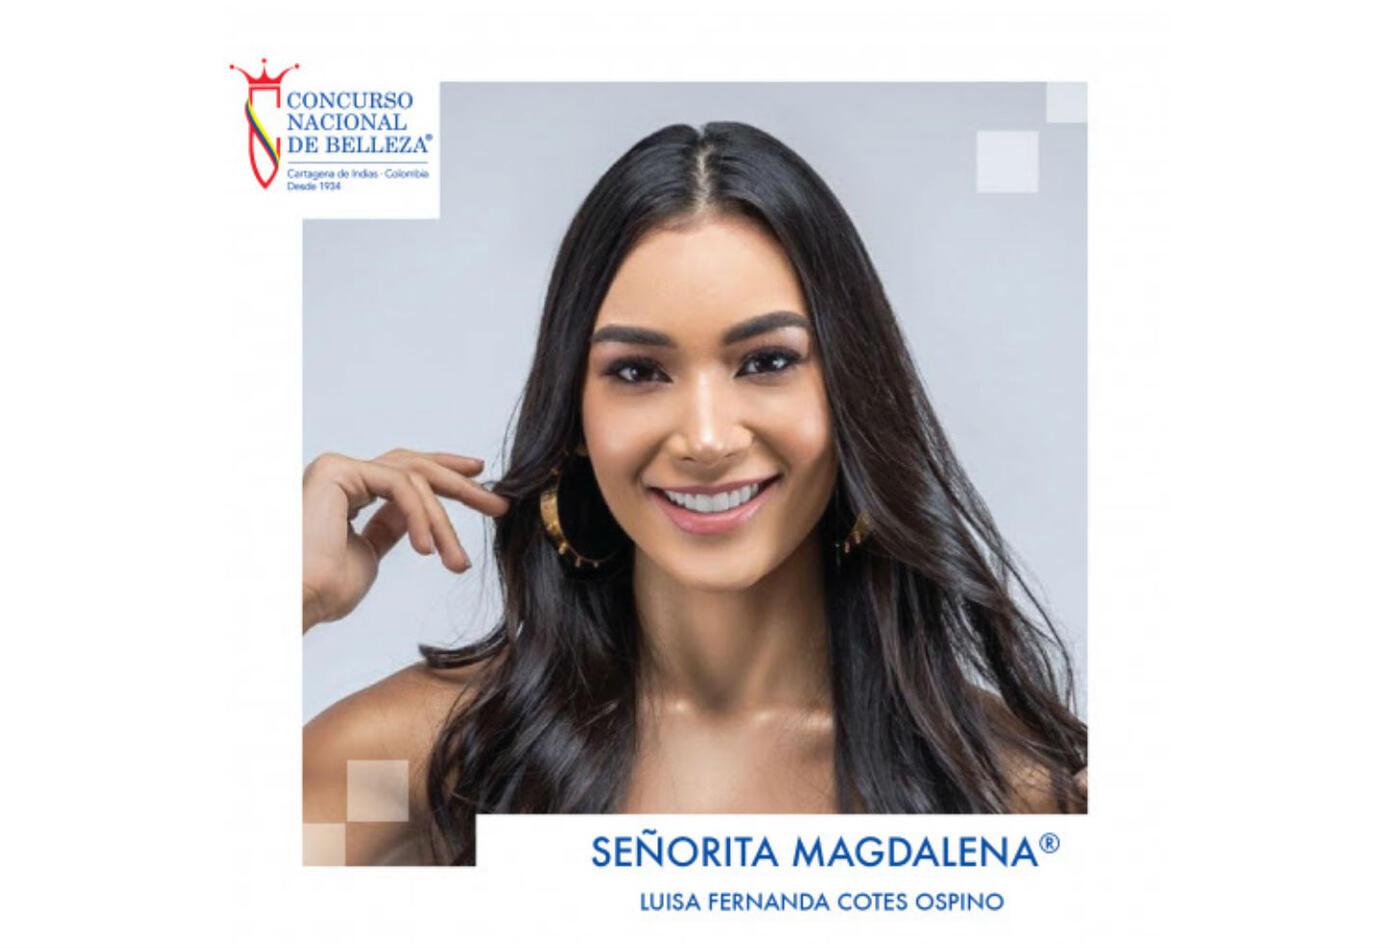 Luisa Fernanda Cotes, Señorita Magdalena 2019.